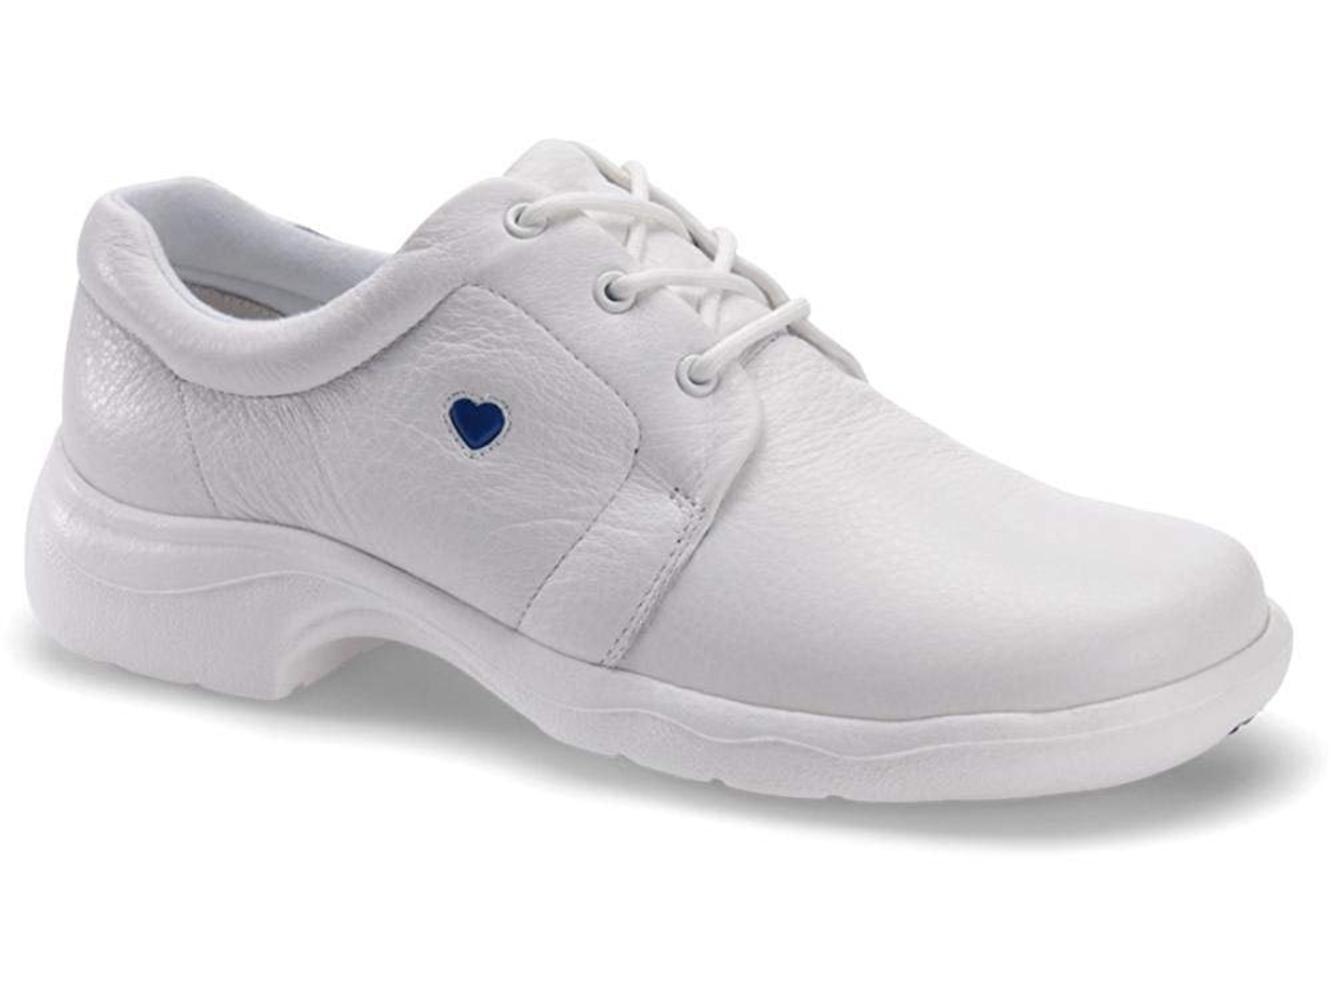 Nurse Mates - Nurse Mates Shoes: Women